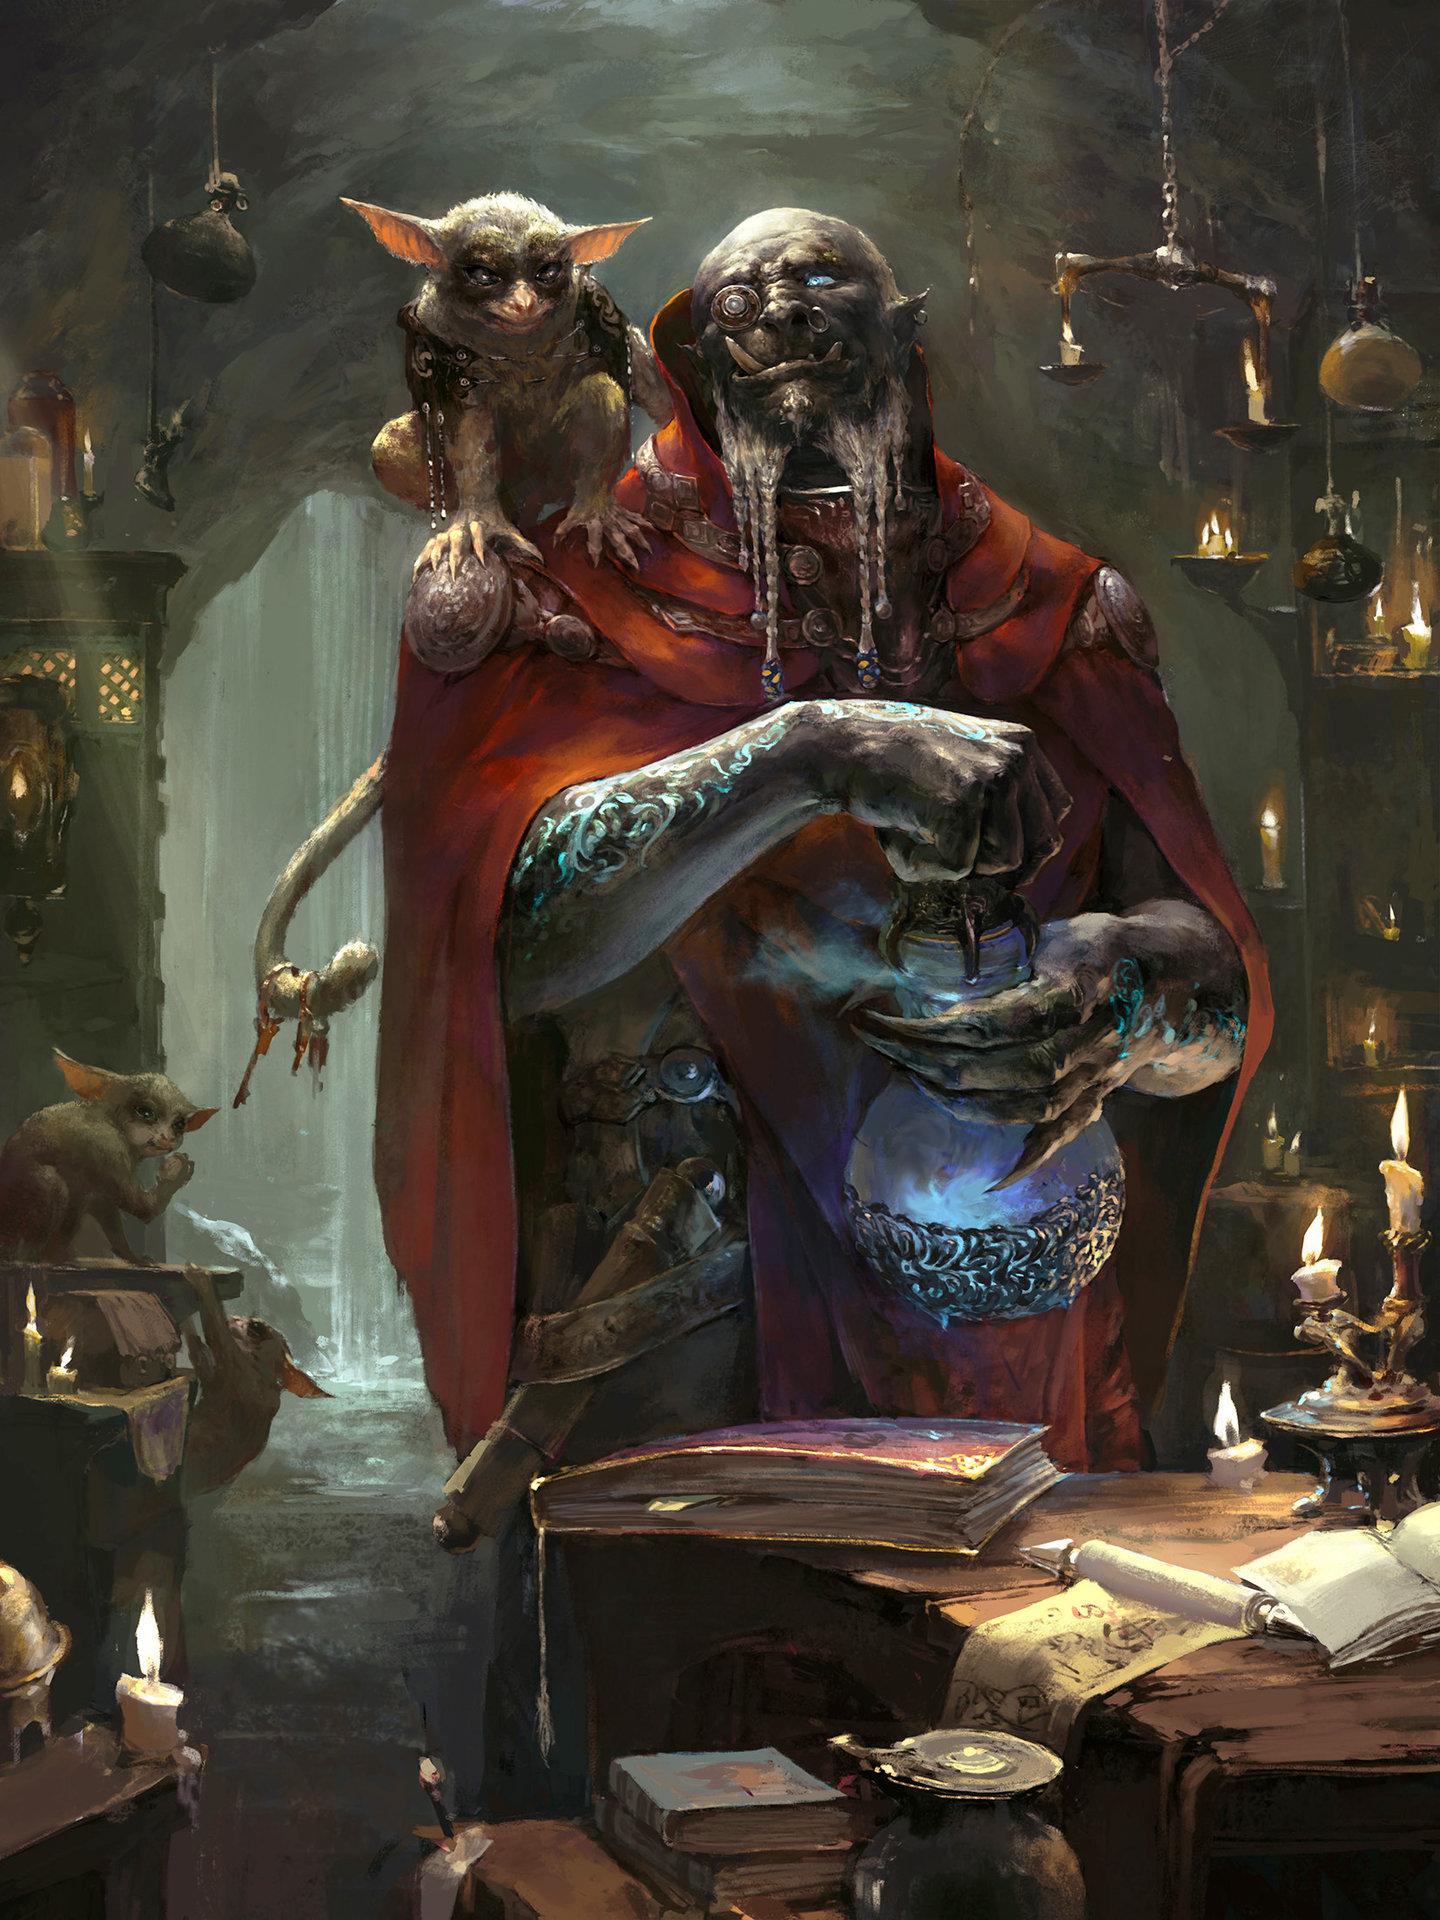 5e] The Artificer, Revisited: Alchemist, Archivist, Battle Smith